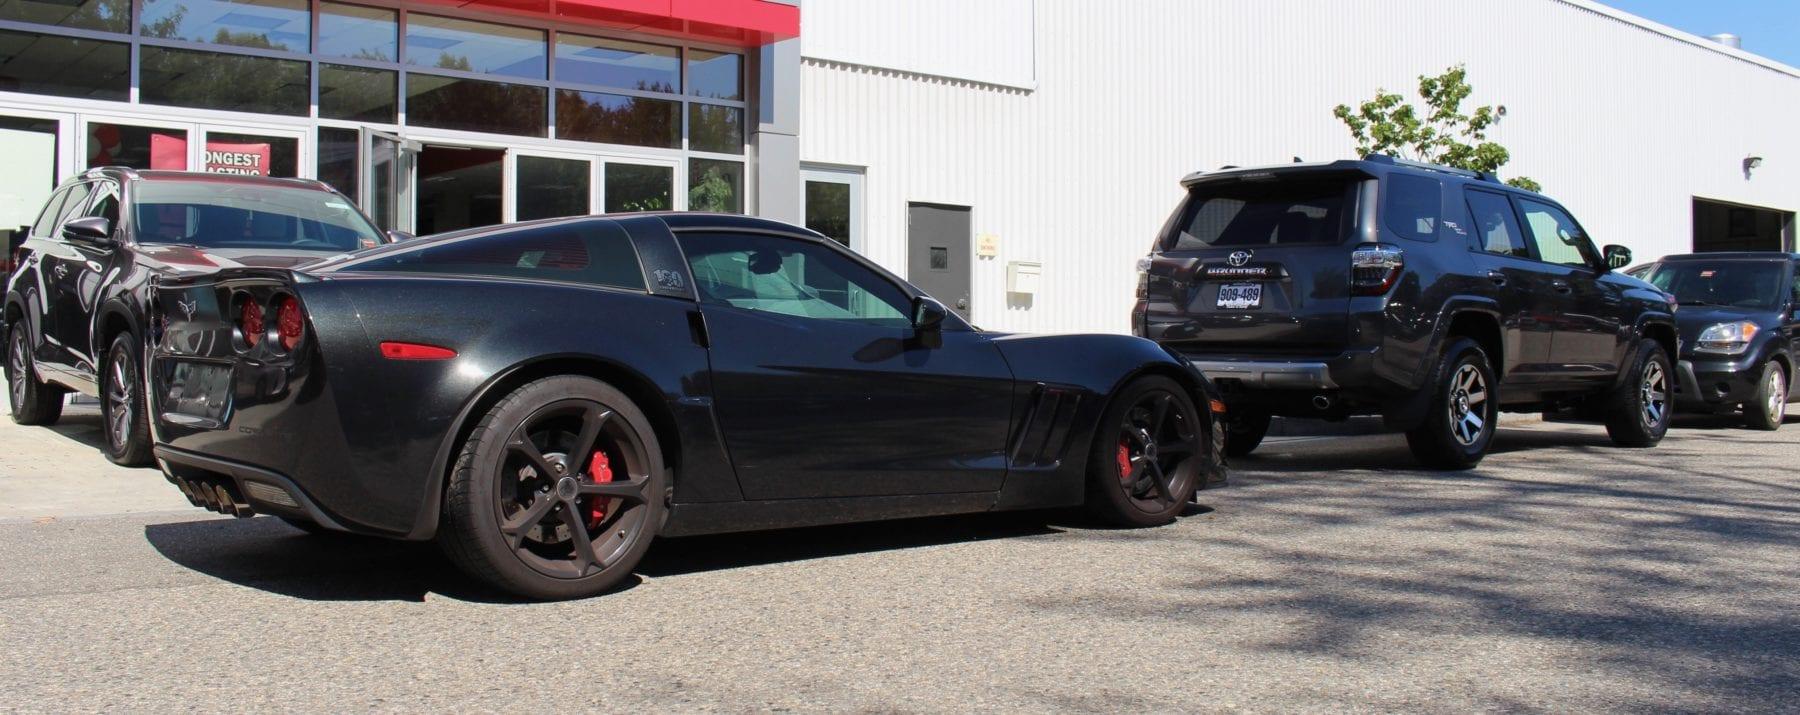 C6 Corvette Grand Sport Centennial Edition and 4Runner TRD Off Road Premium